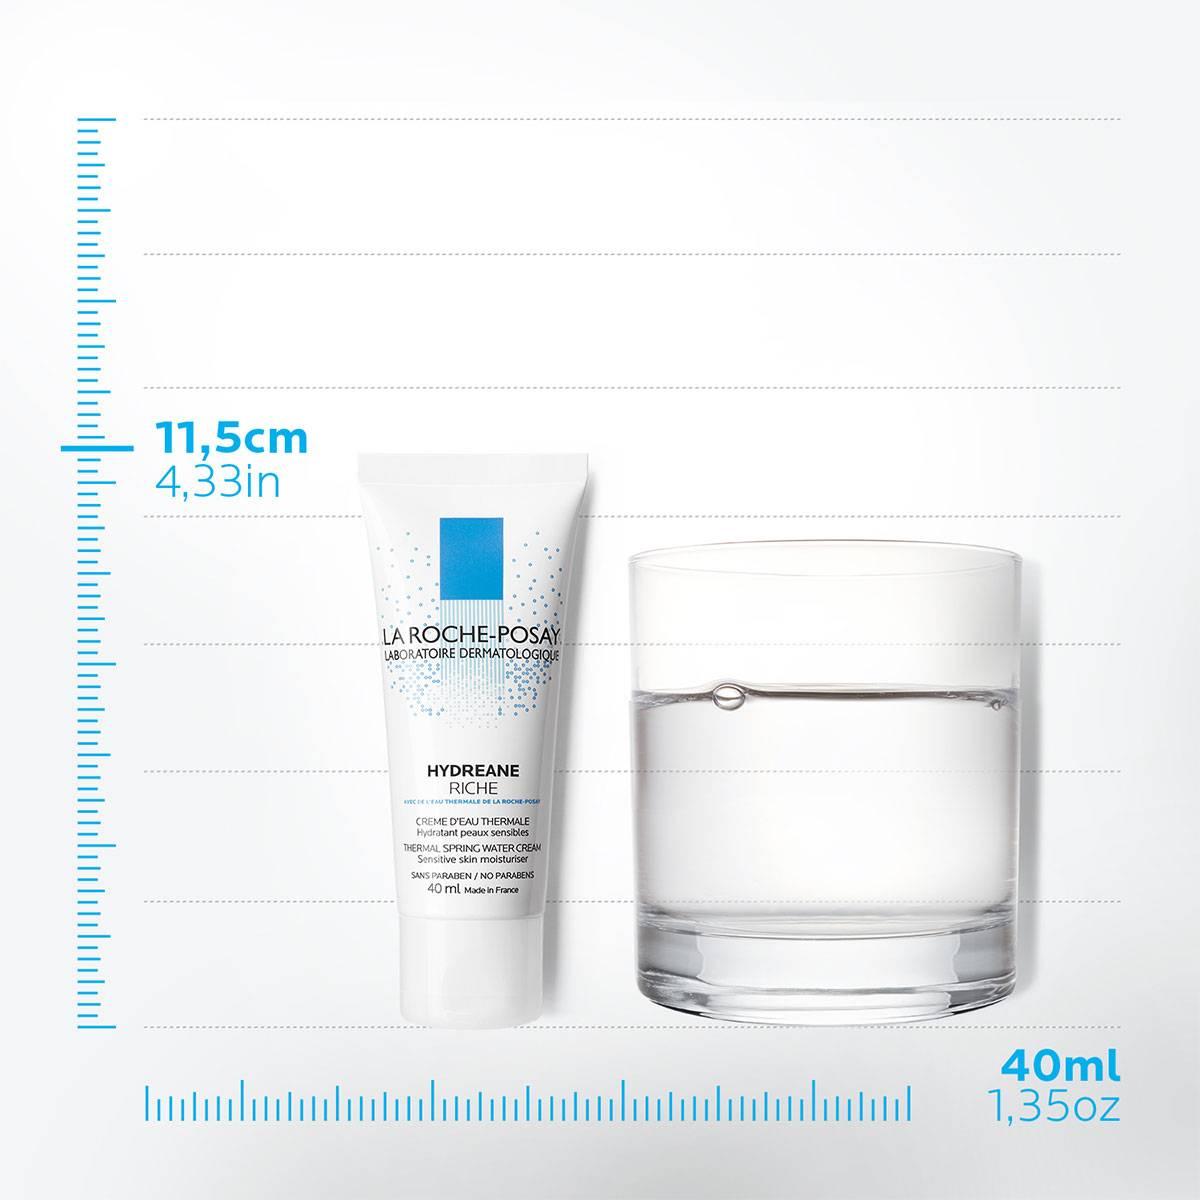 La Roche Posay ProductPage Hydreane Rich 40ml 3337872410772